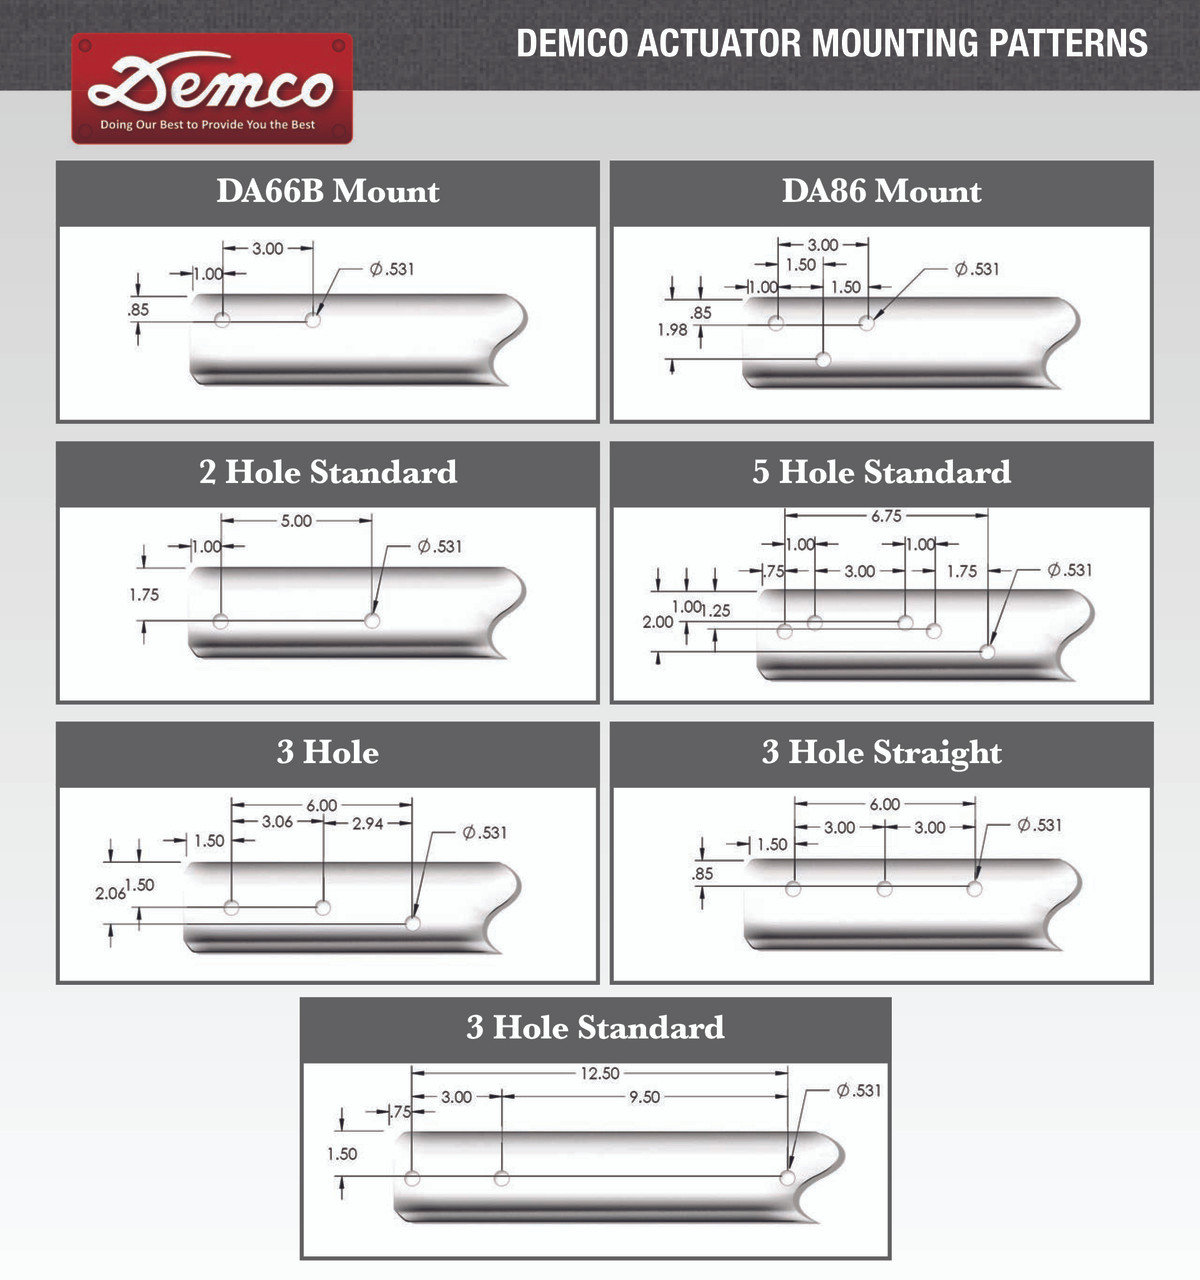 8101022 --- Demco Hydraulic Brake Actuator with Channel Centered - 12,500 lb Capacity - Model DA10